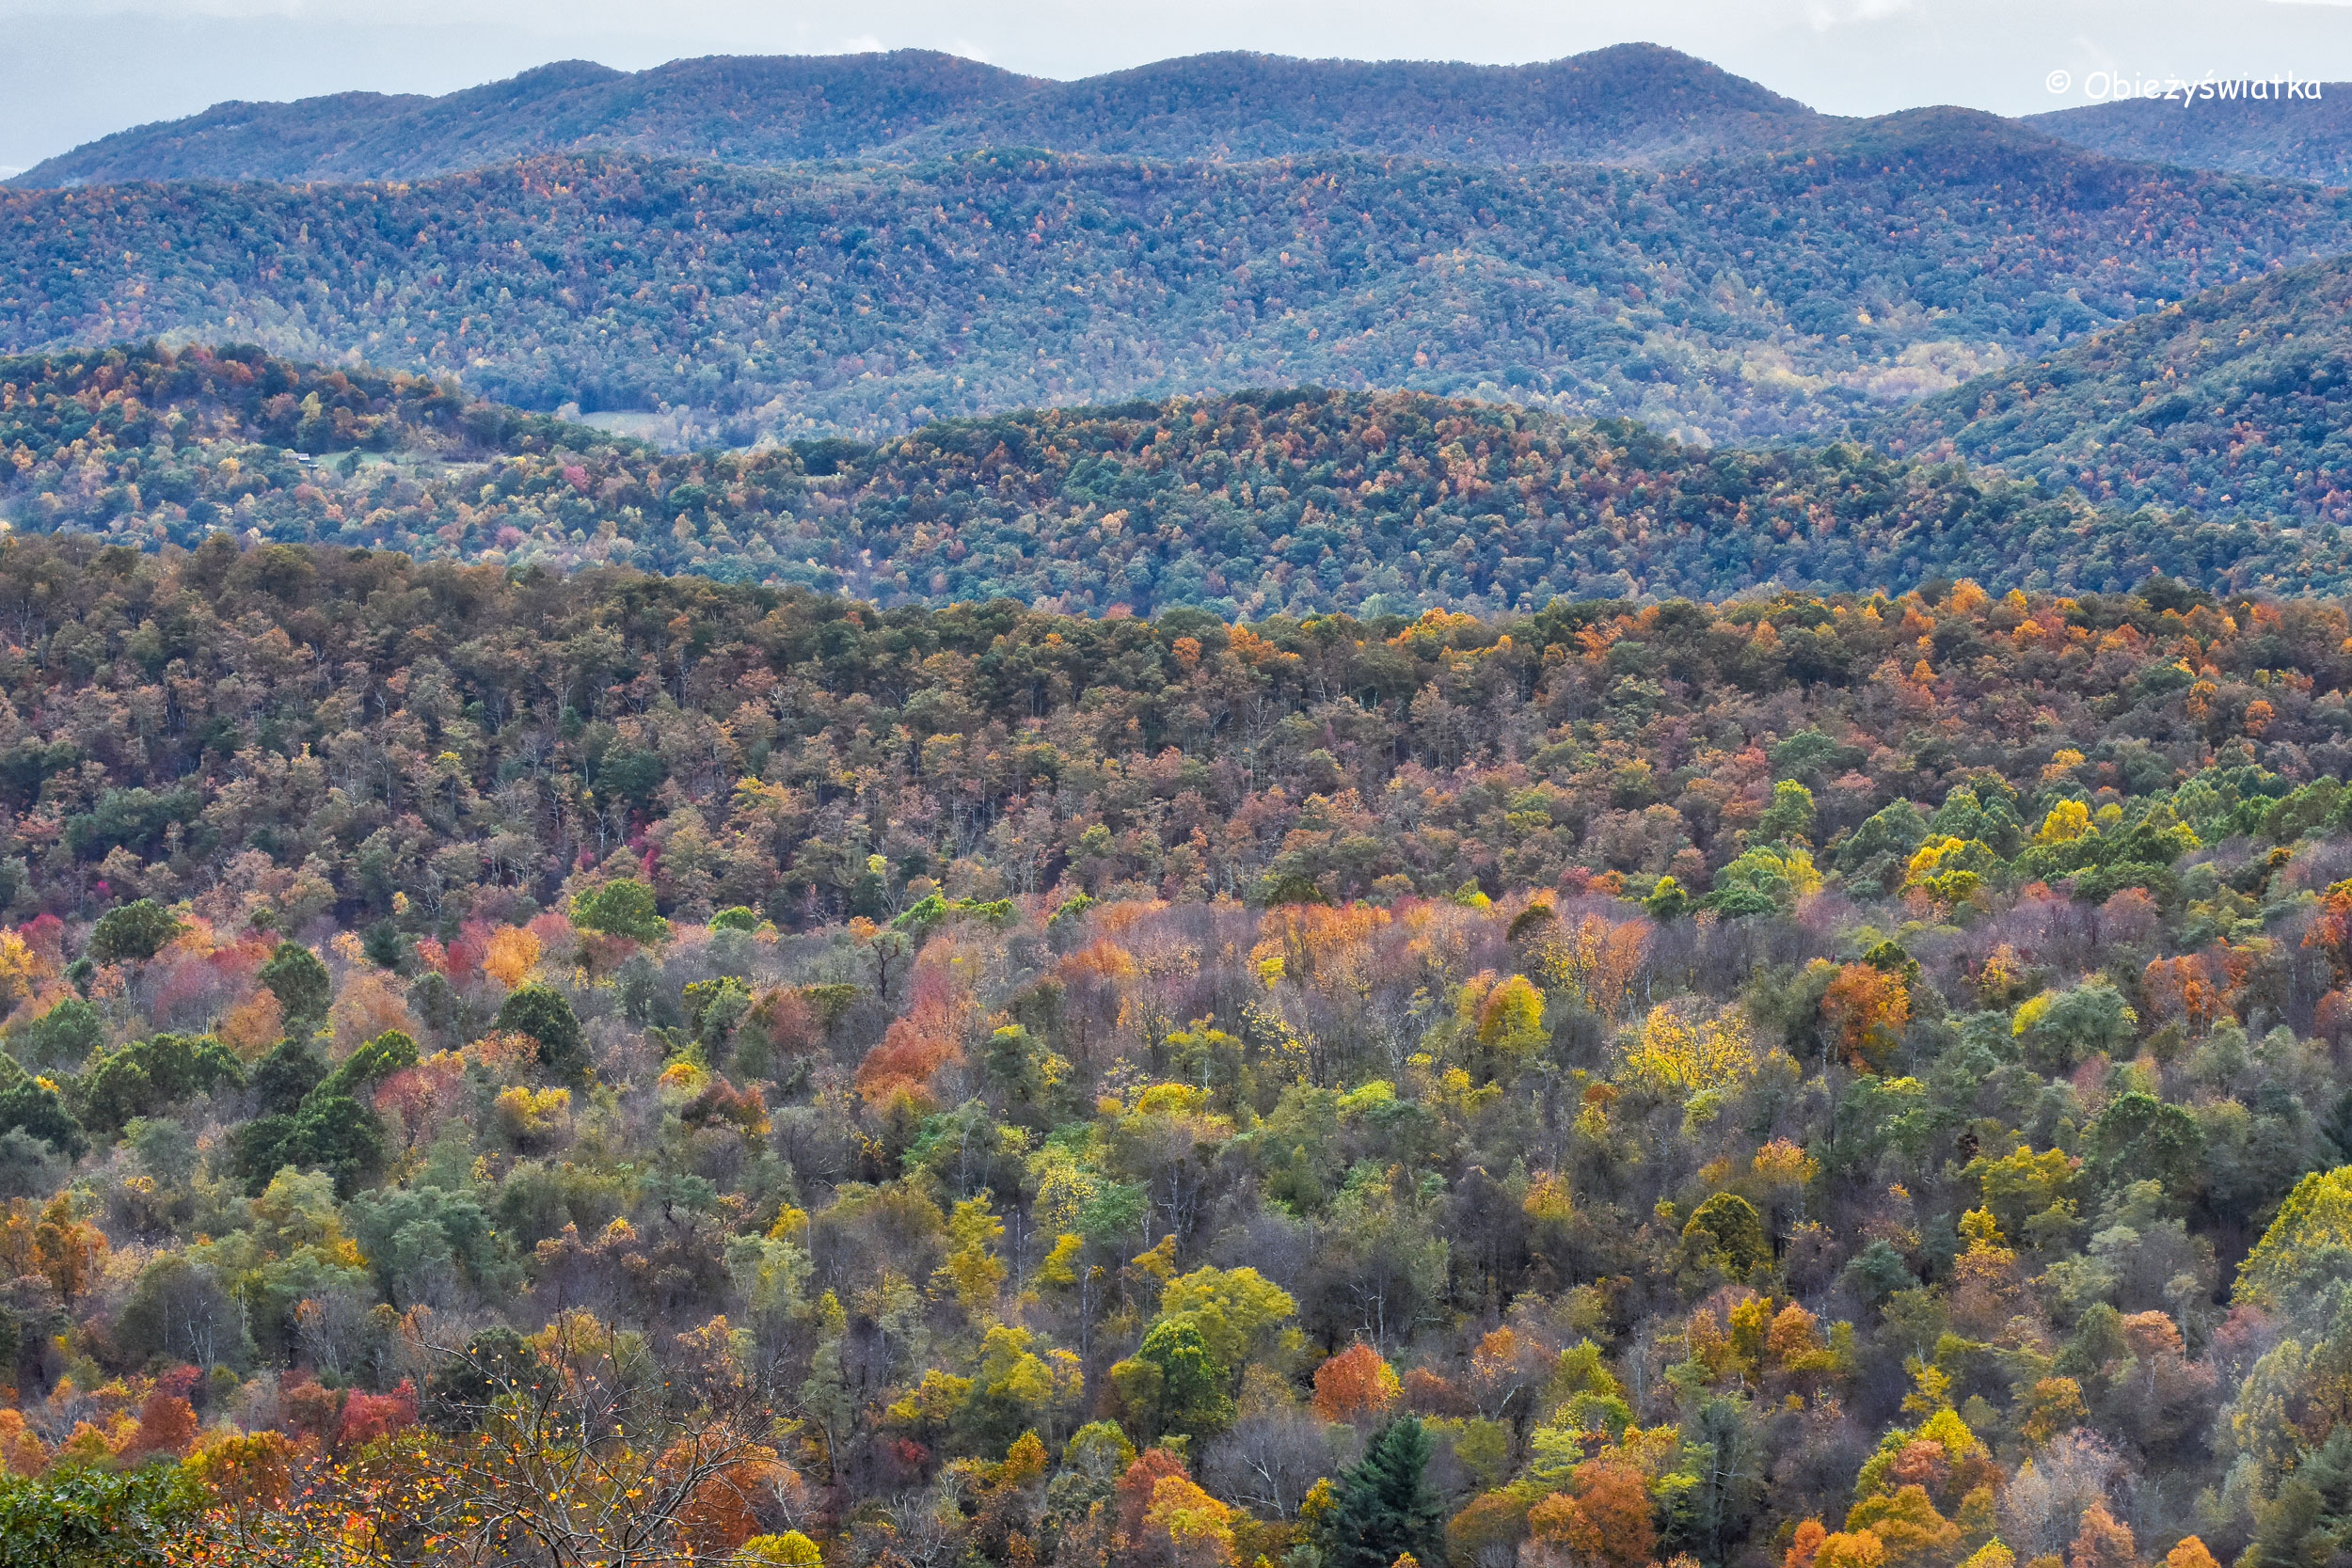 Appalachy jesienią, Park Narodowy Shenandoah, USA